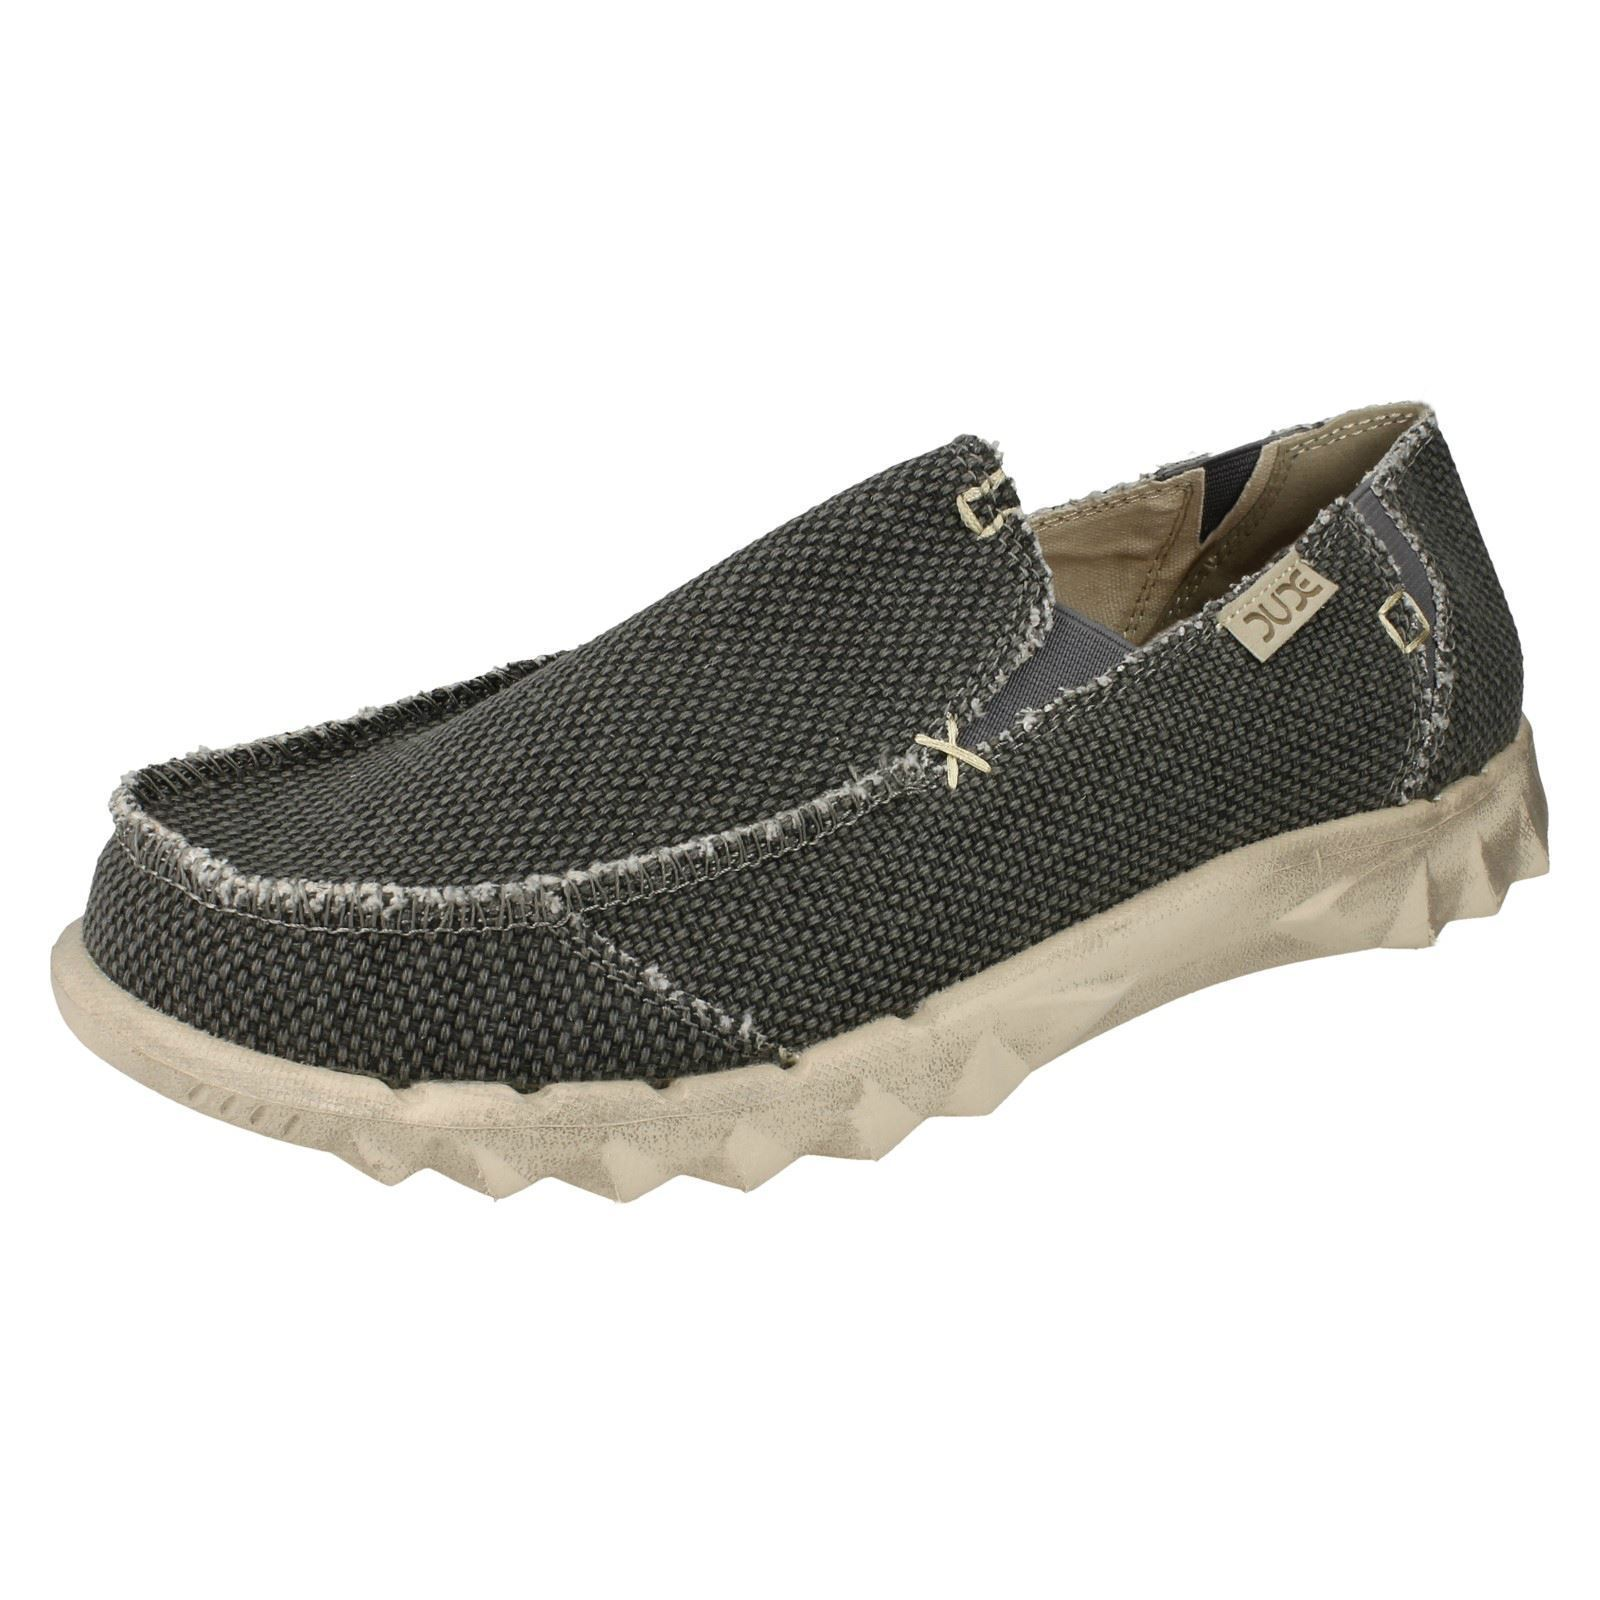 Hombre HEY DUDE FARTY BRAIDED Zapatos CANVAS CASUAL SLIP ON Zapatos BRAIDED 7ebd6b